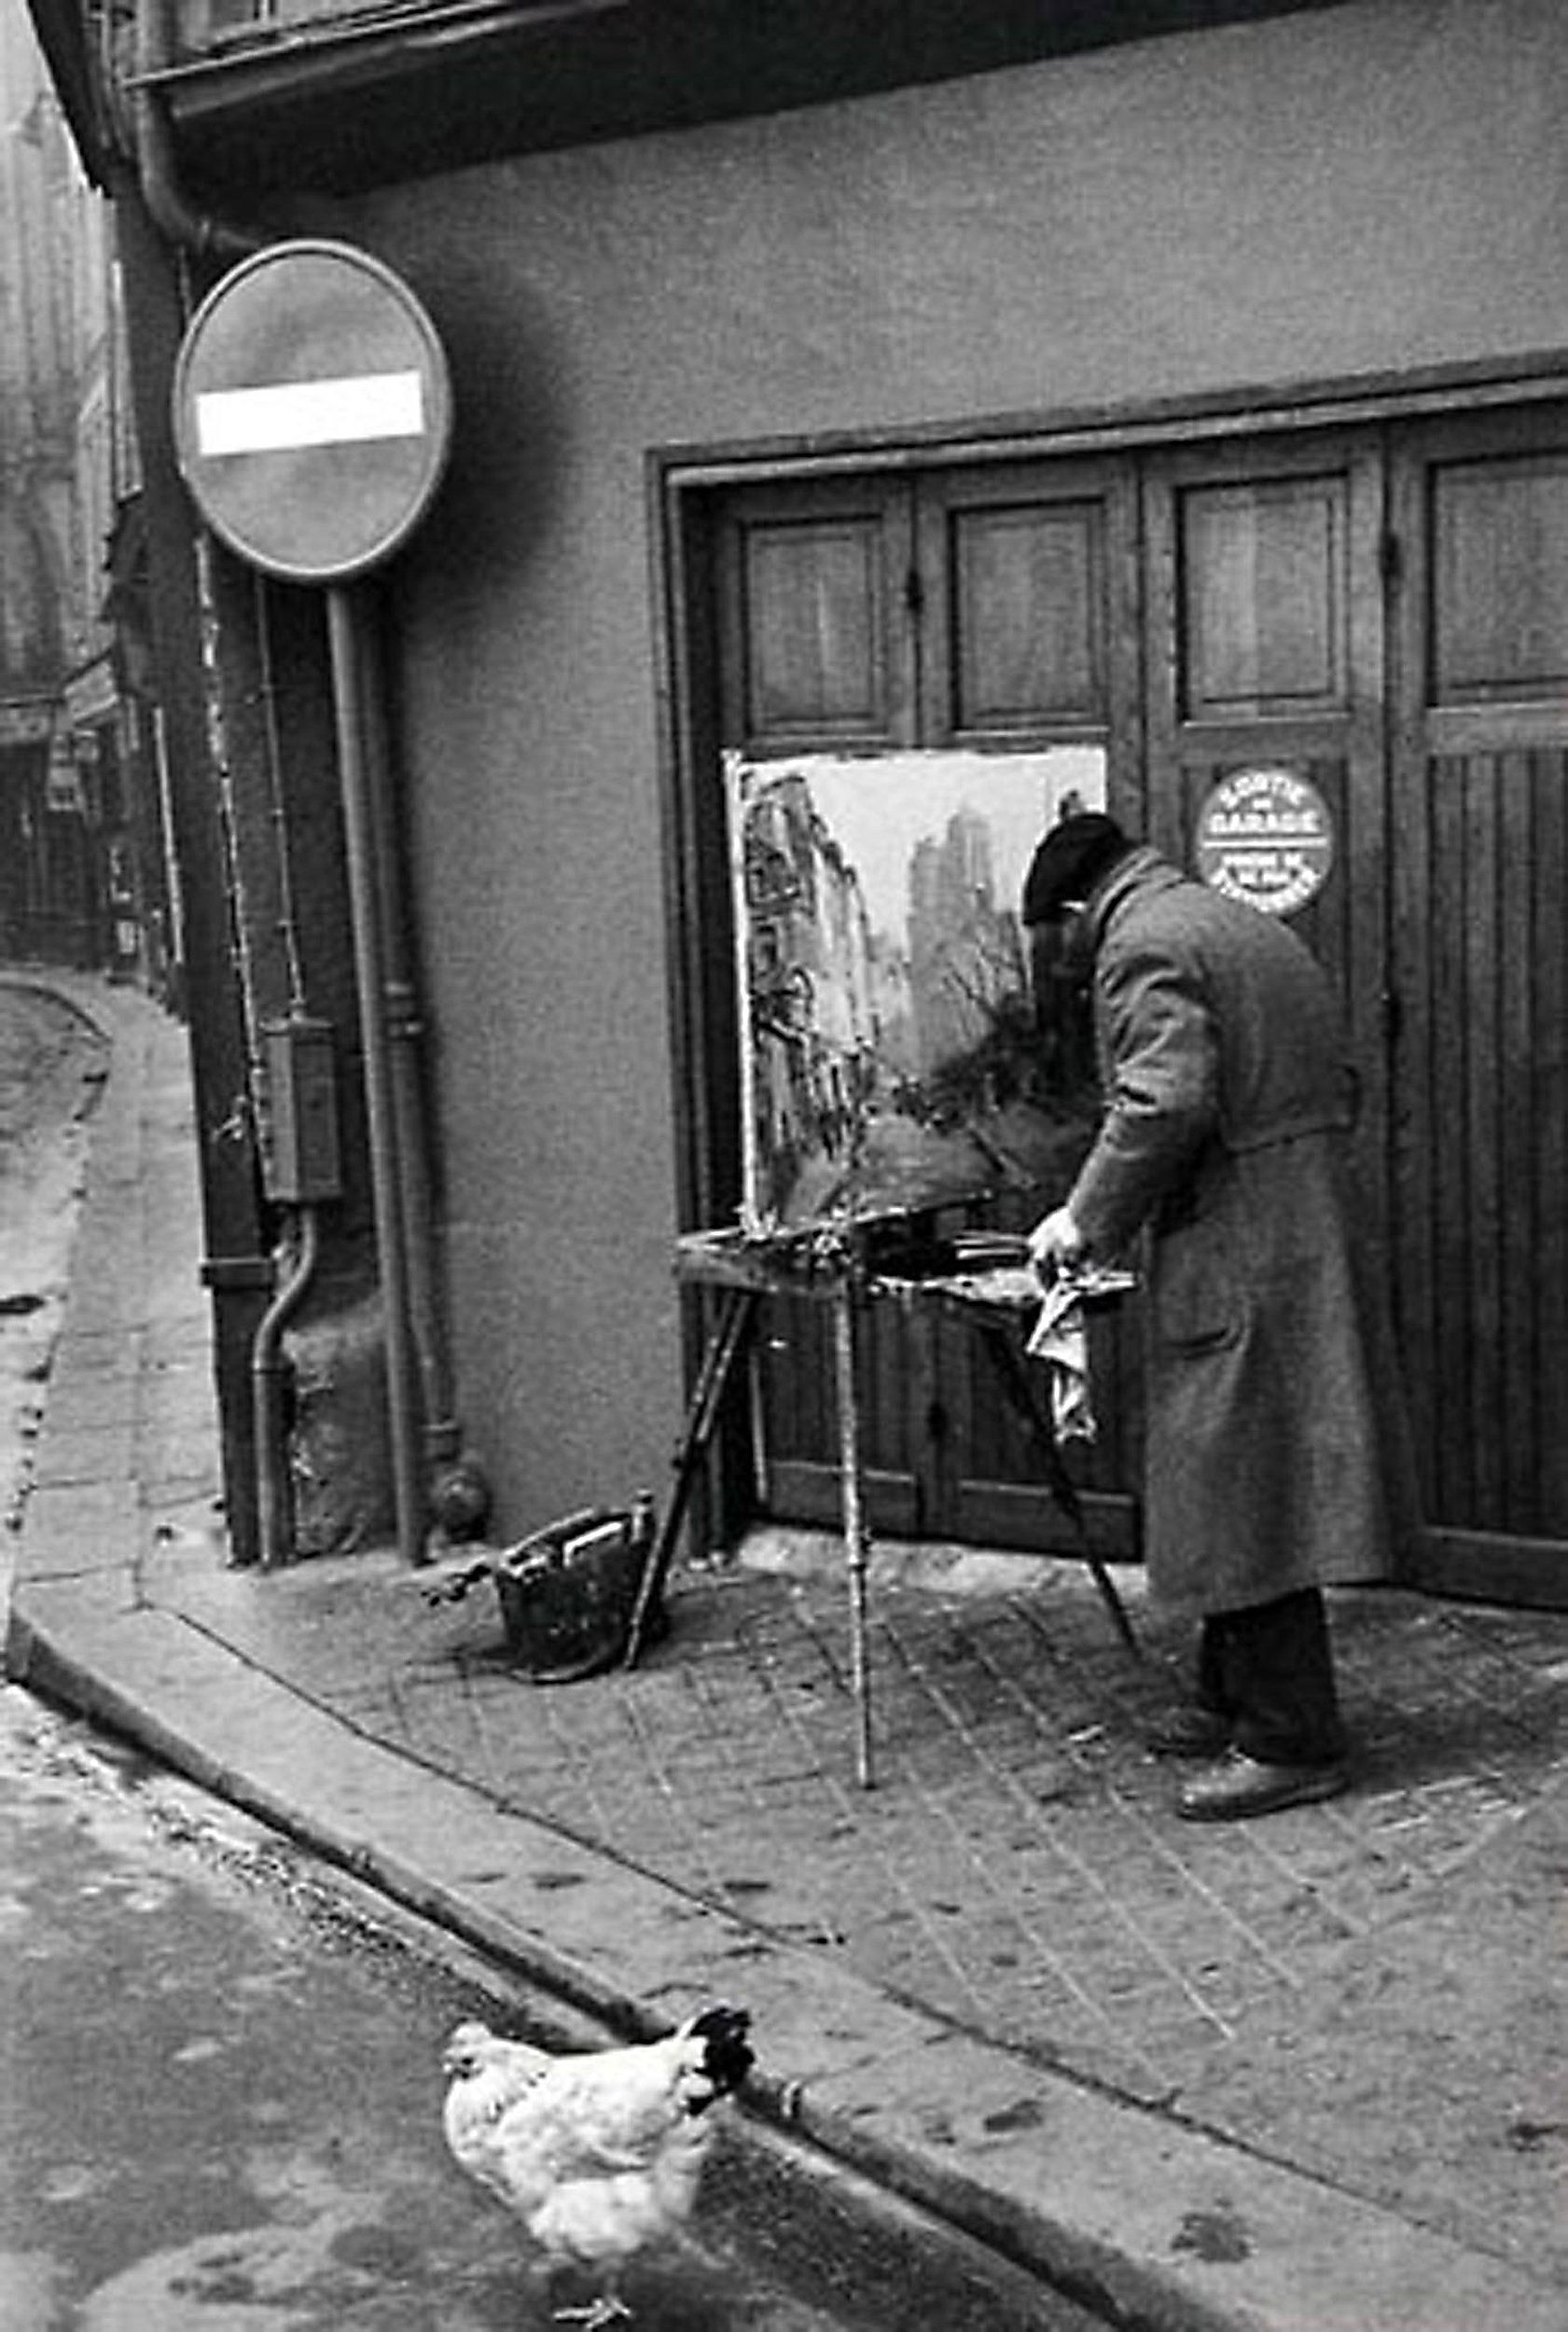 HANNON_wandering_hen_(paris)_1959_11x14_high.jpg